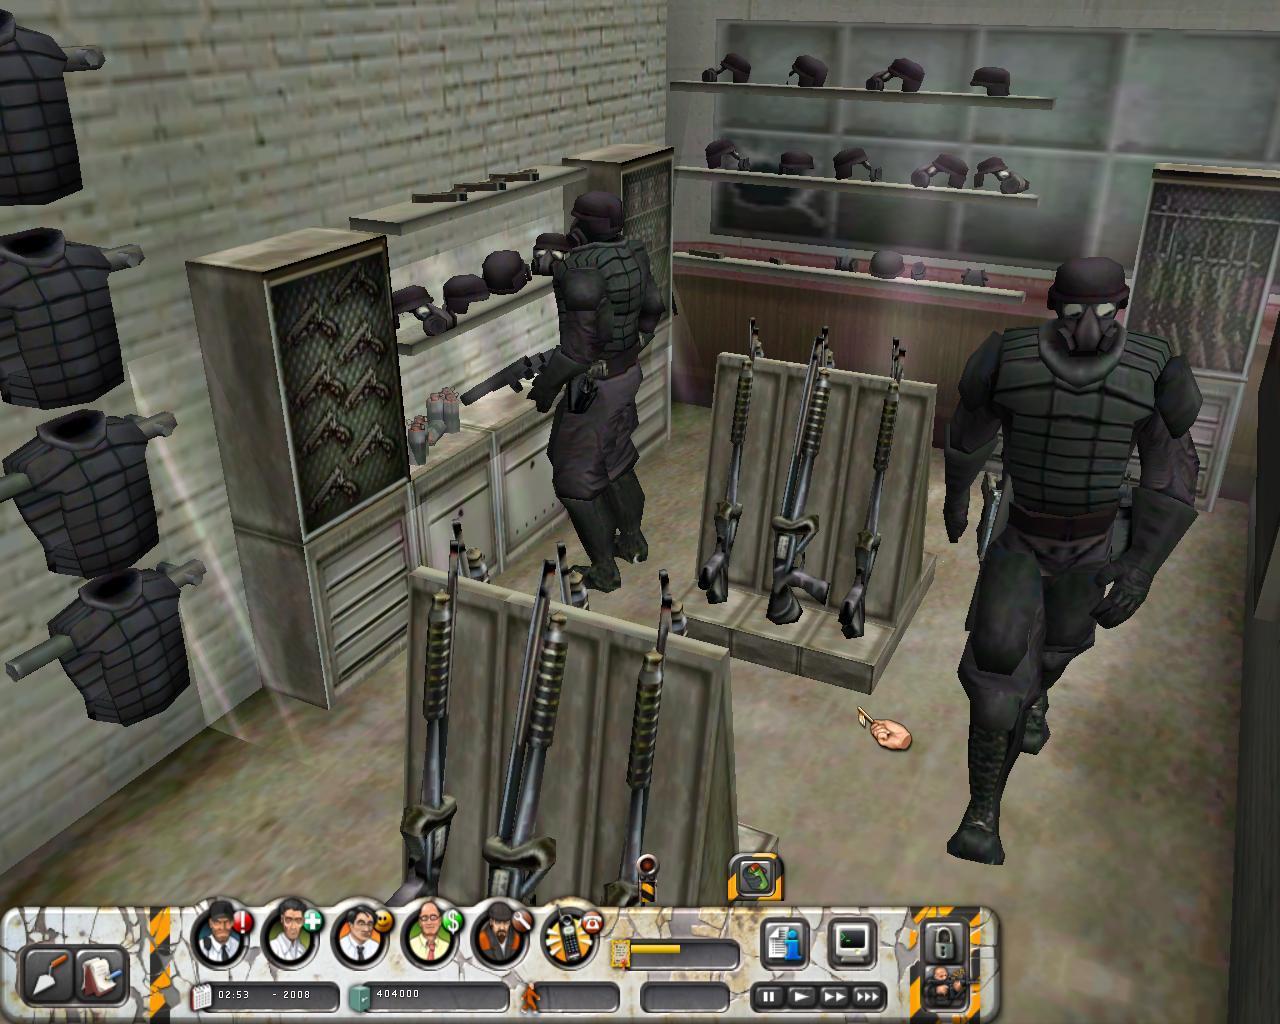 Download prison tycoon 3: lockdown (windows) my abandonware.